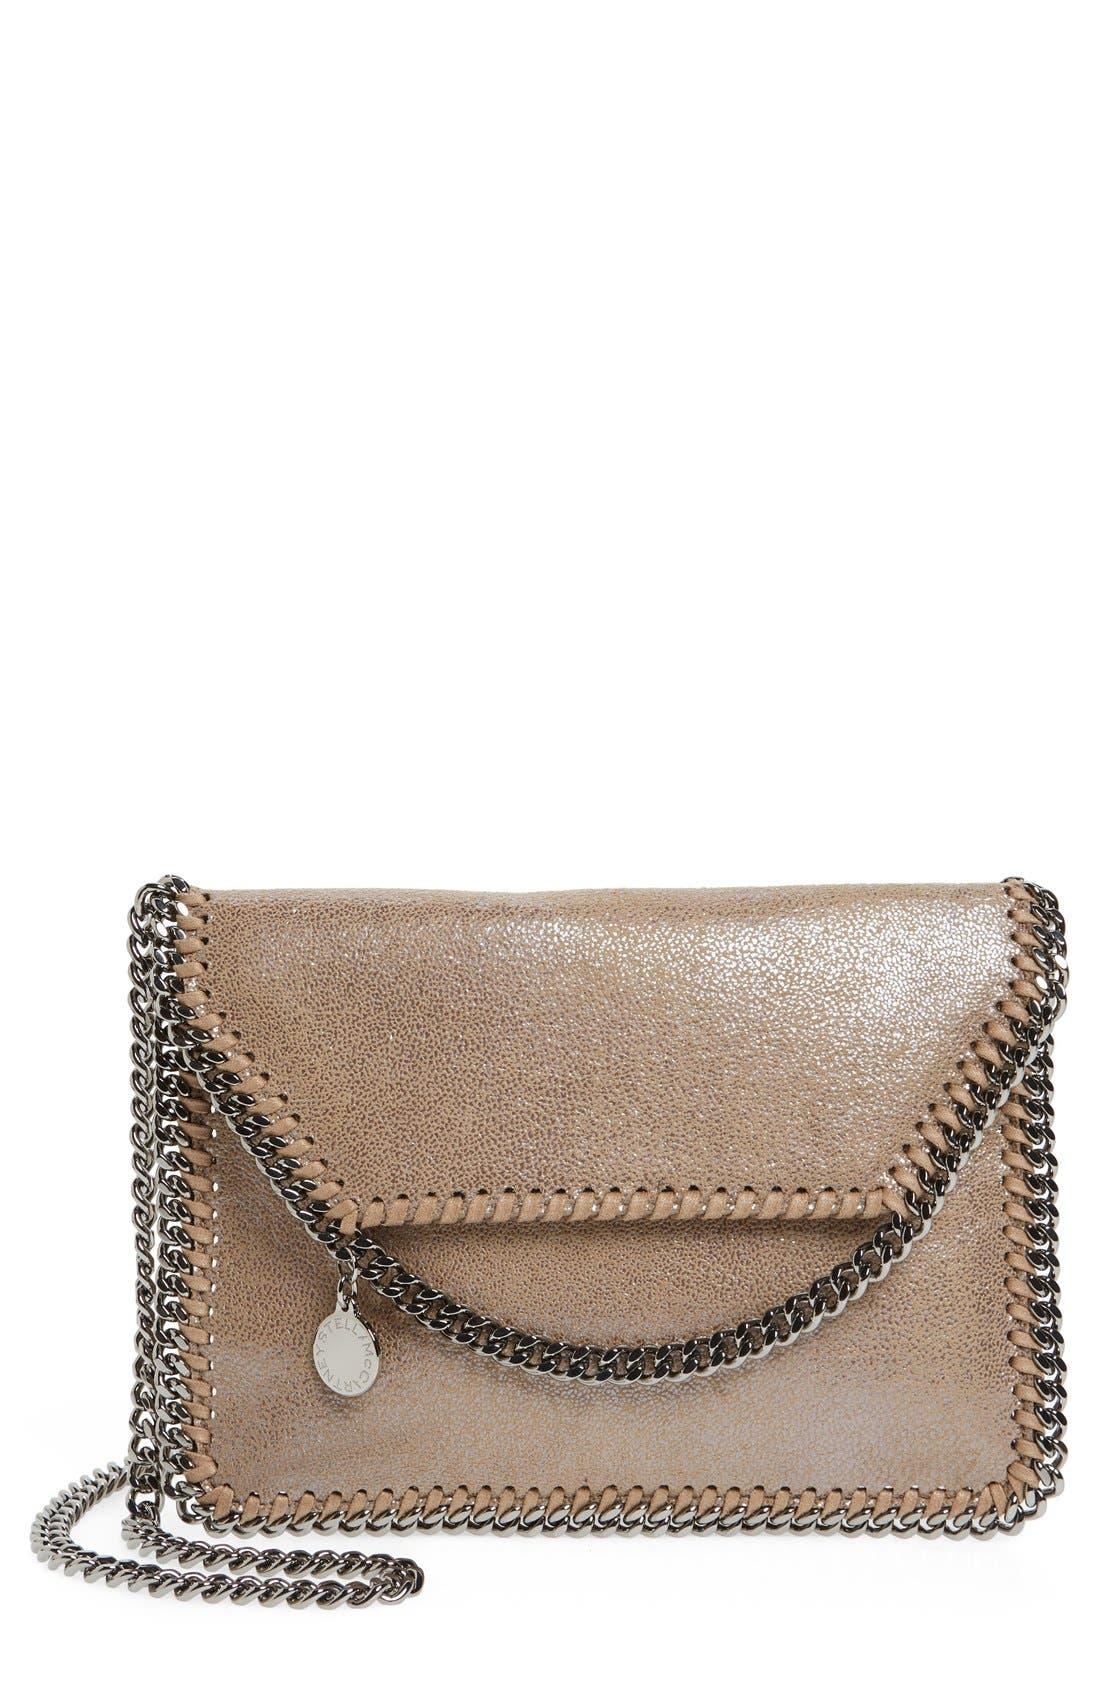 STELLA MCCARTNEY Mini Falabella Faux Leather Crossbody Bag